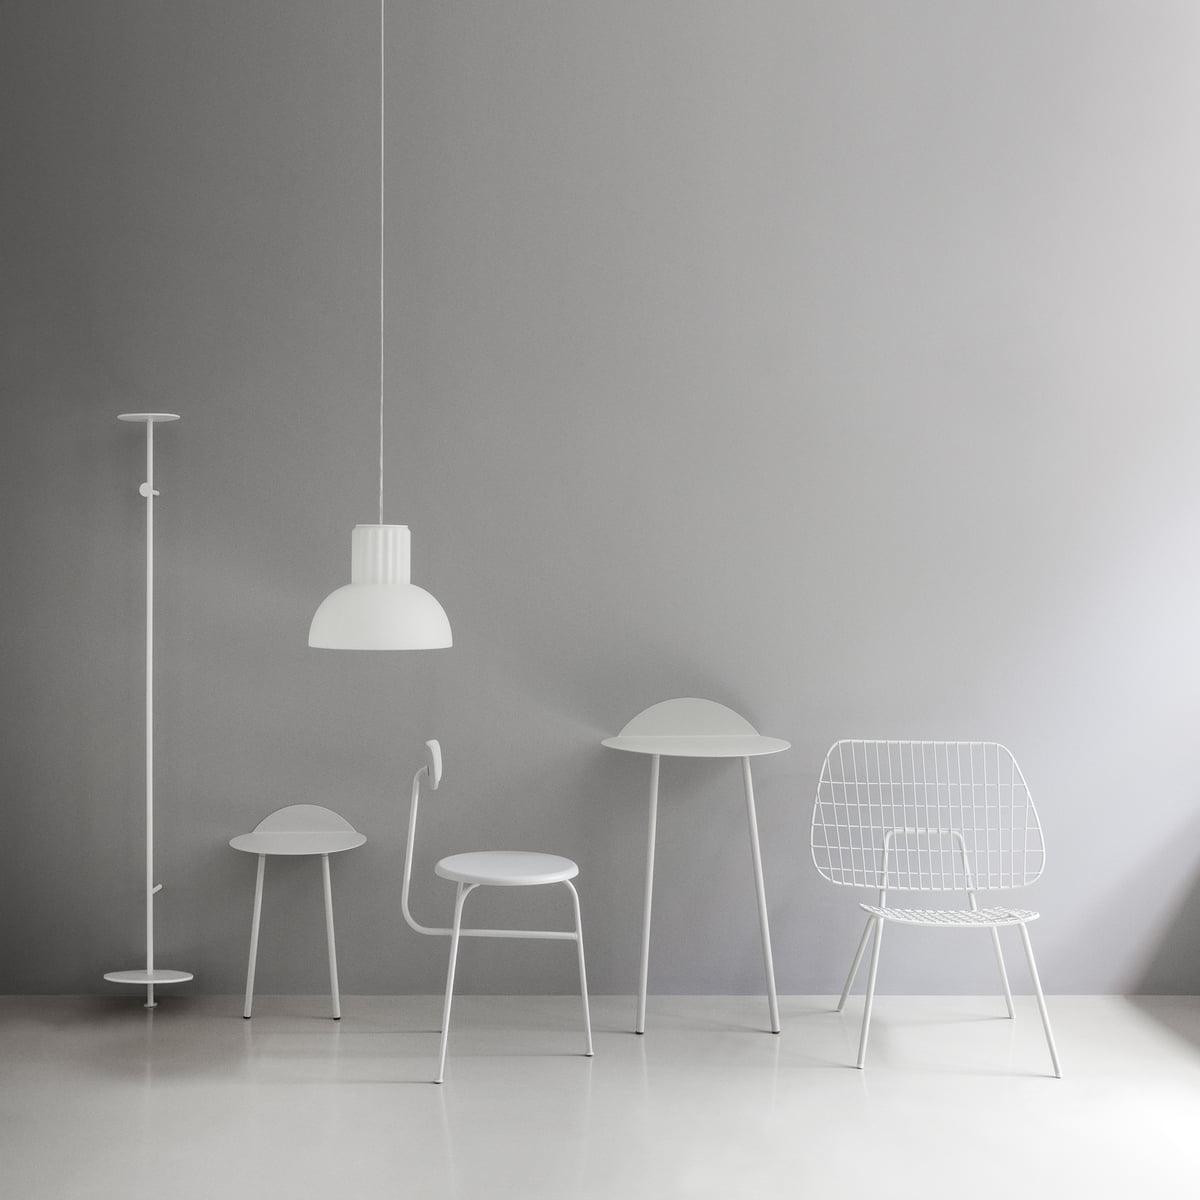 Wm String Lounge Chair By Menu Connox Shop